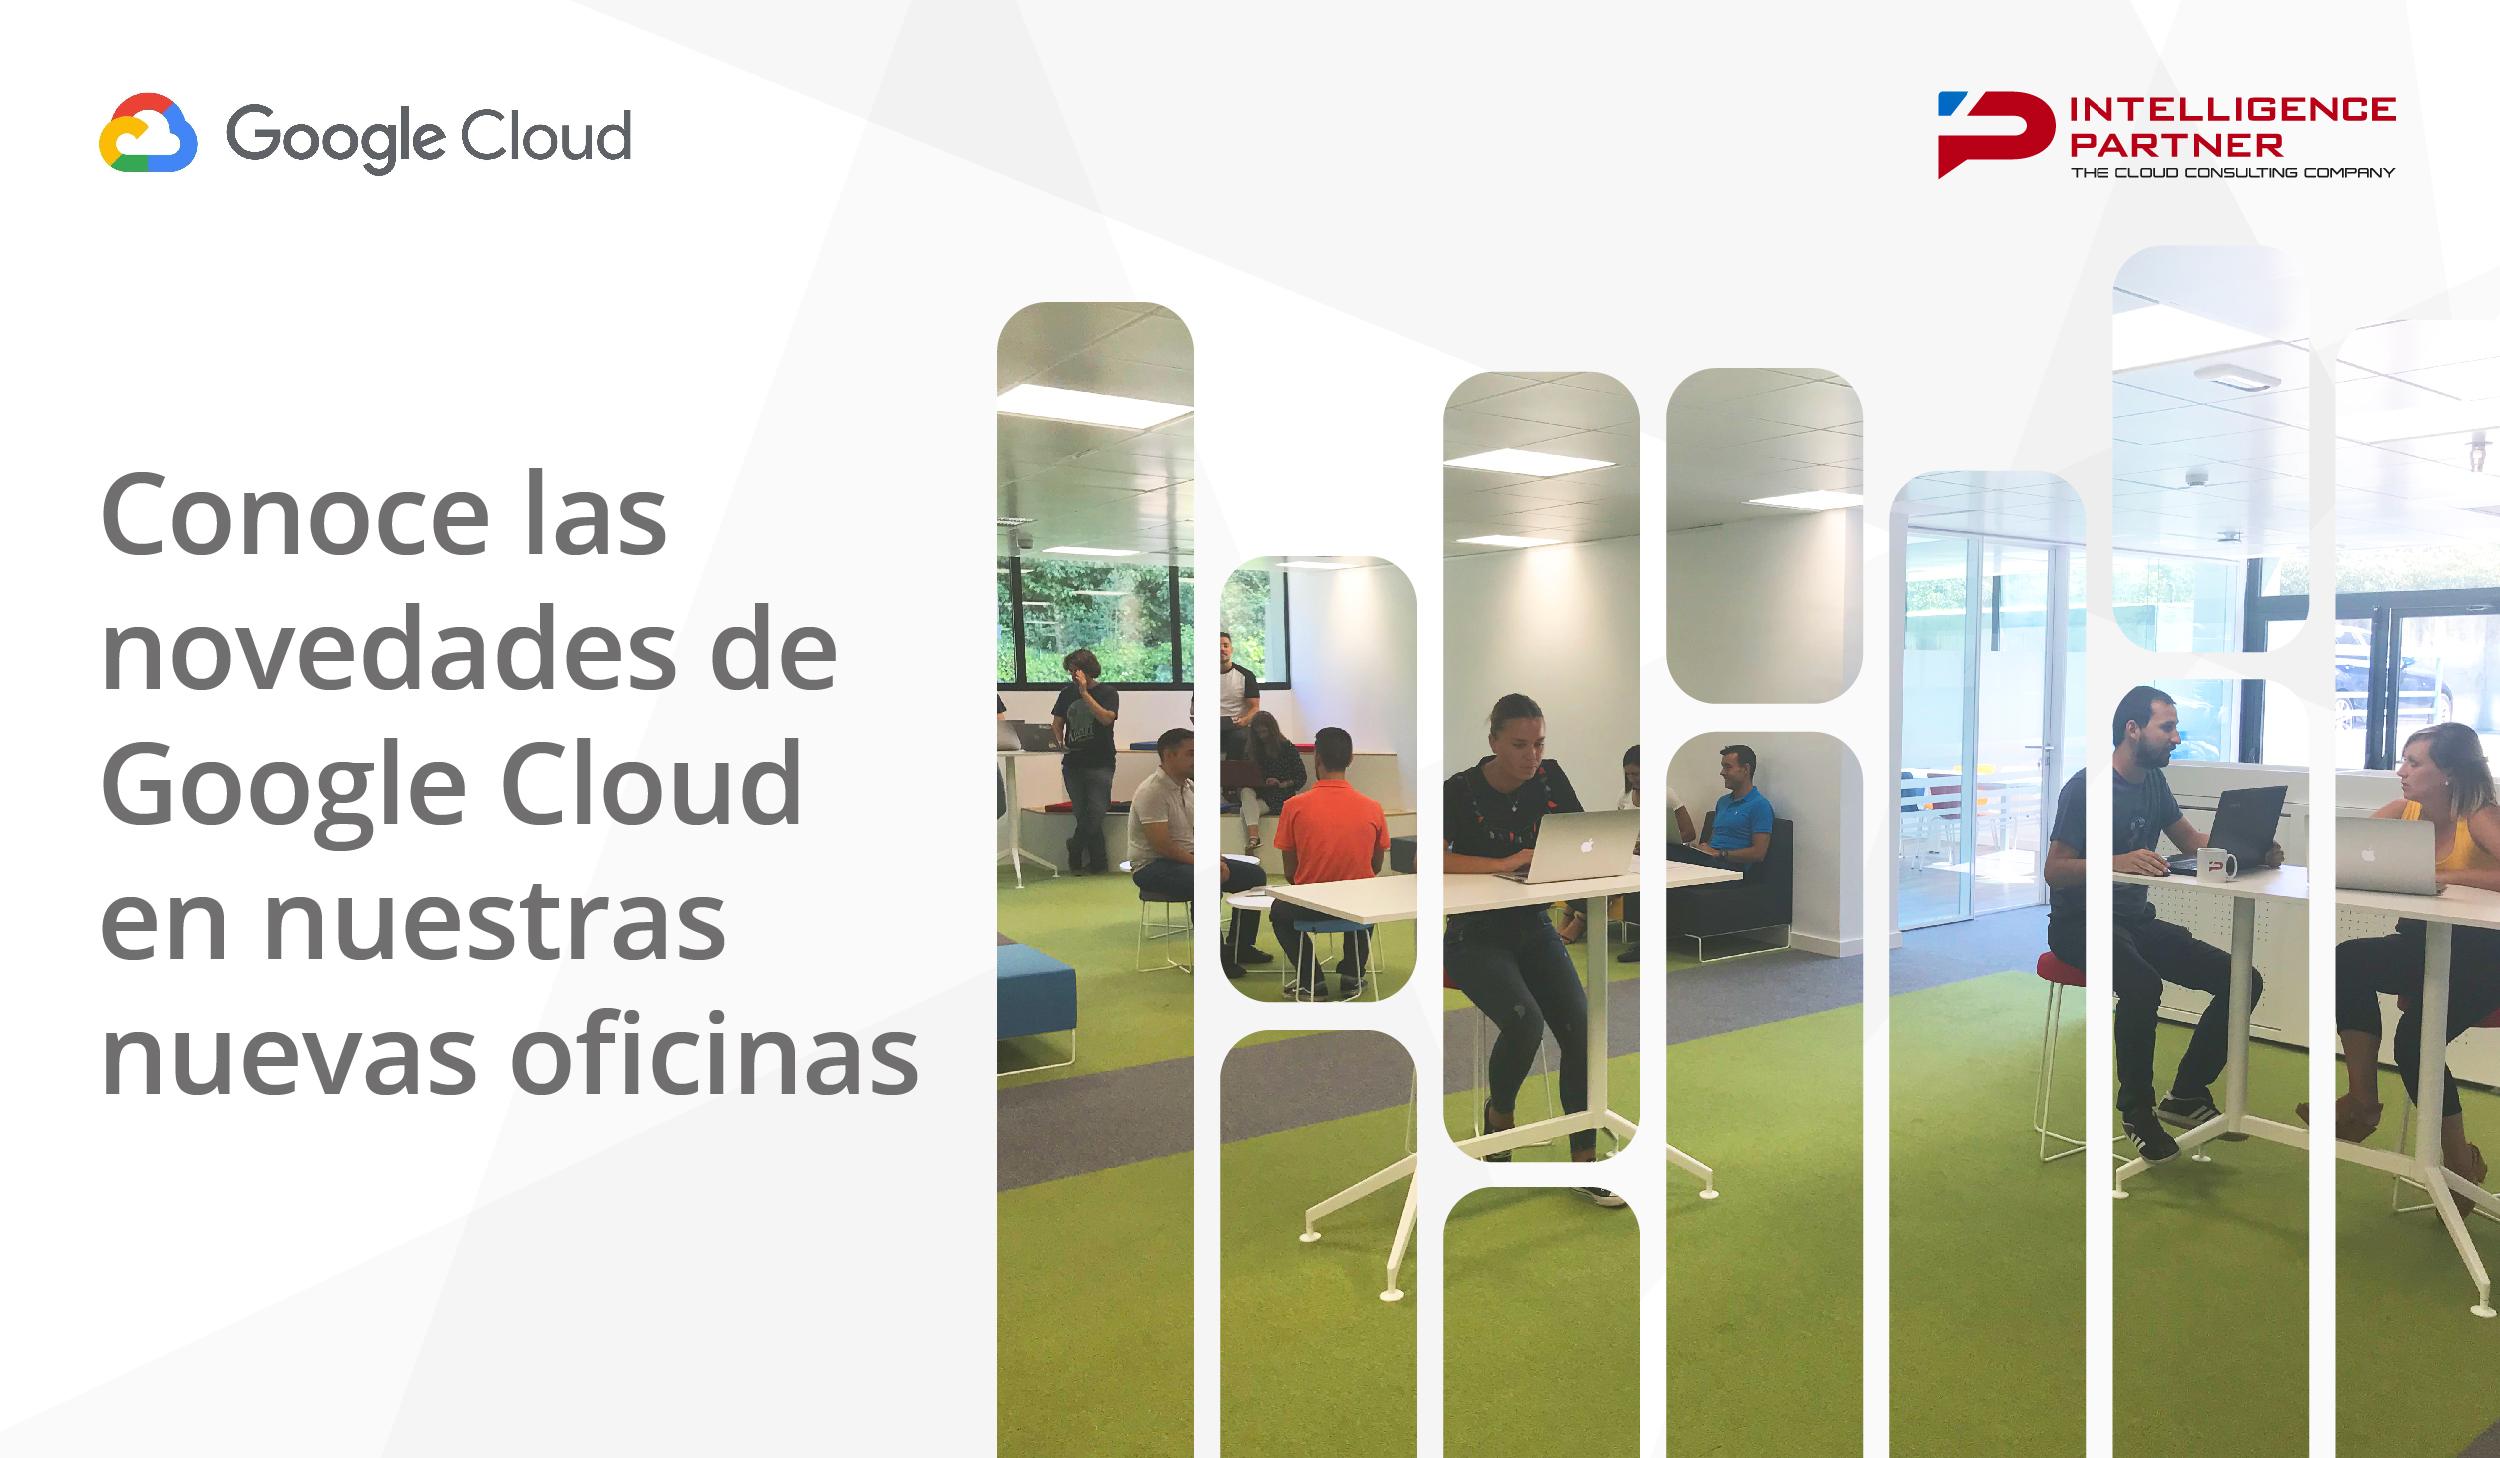 novedades Google Cloud